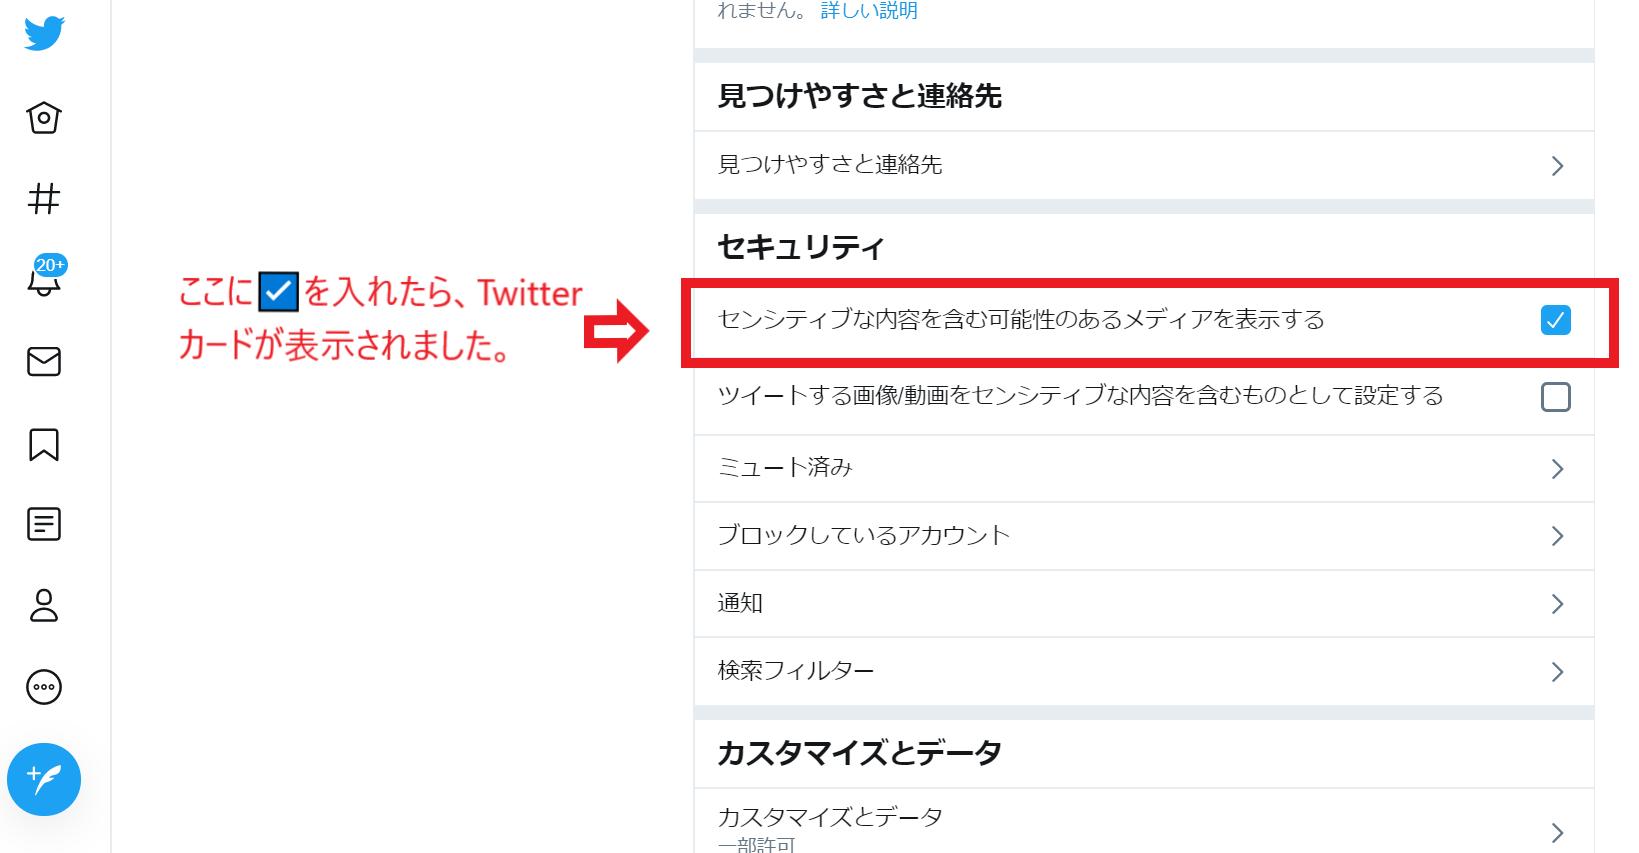 Twitterでプライバシー設定を変更する説明画像